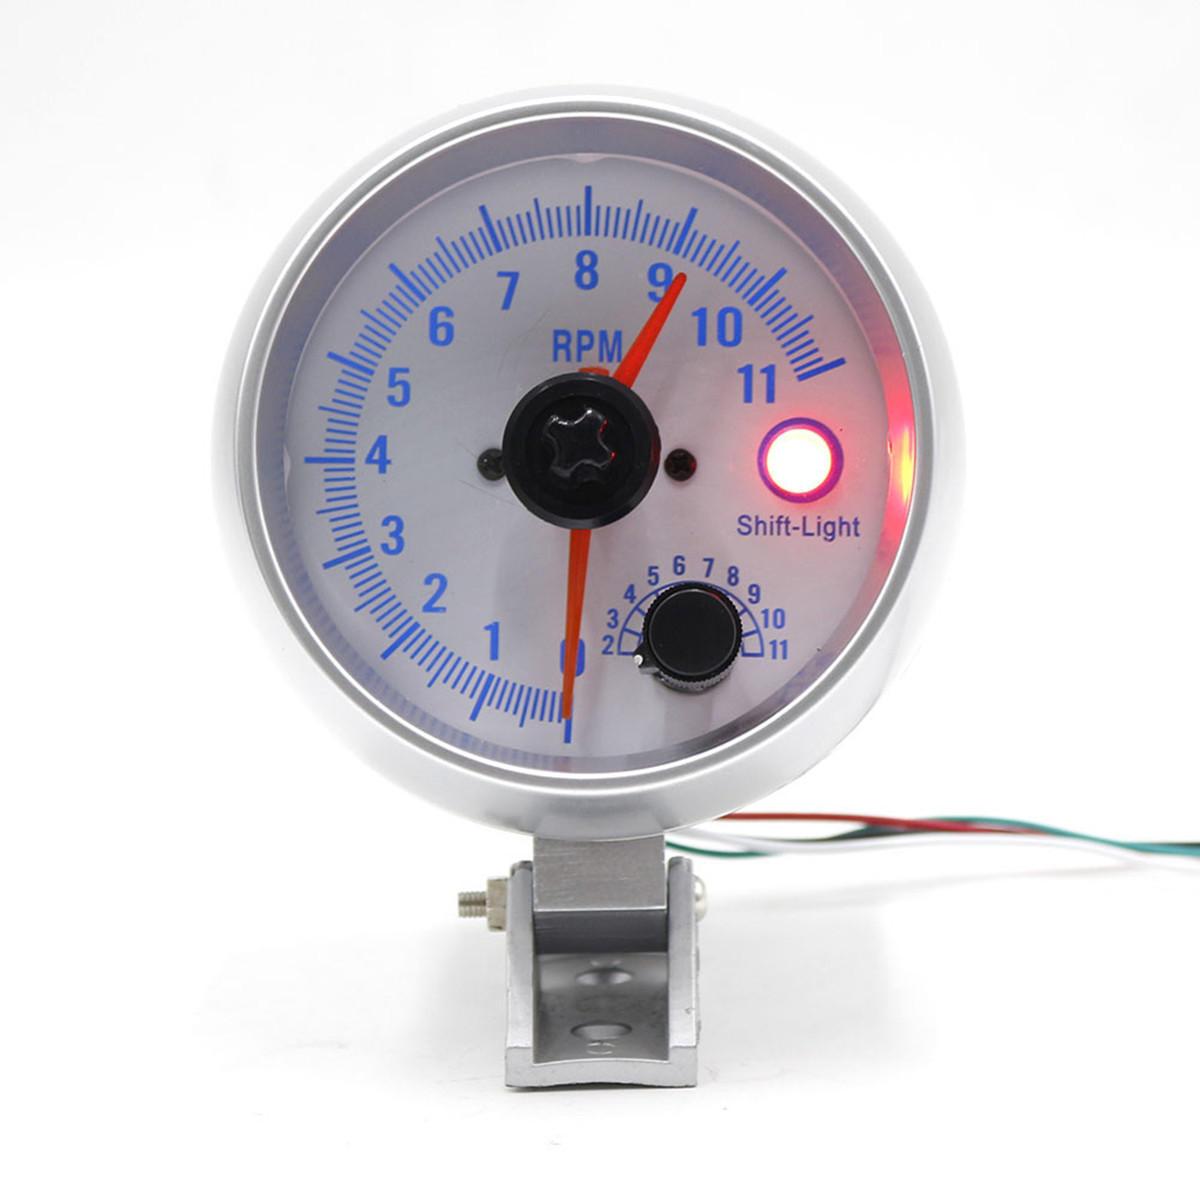 3.5 Inch Car LED Shift Warning Light Tachometer Tacho Gauge Step Motor 0-11000 RPM